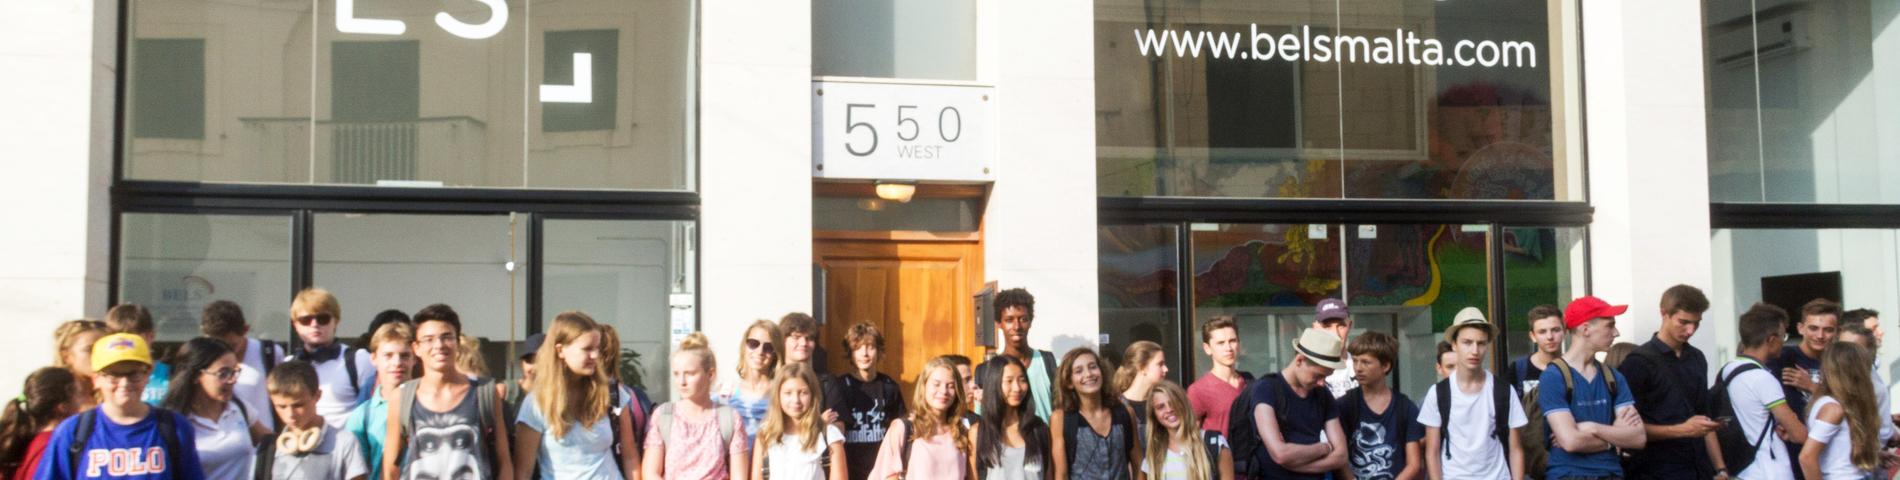 Imagen 1 de la escuela BELS